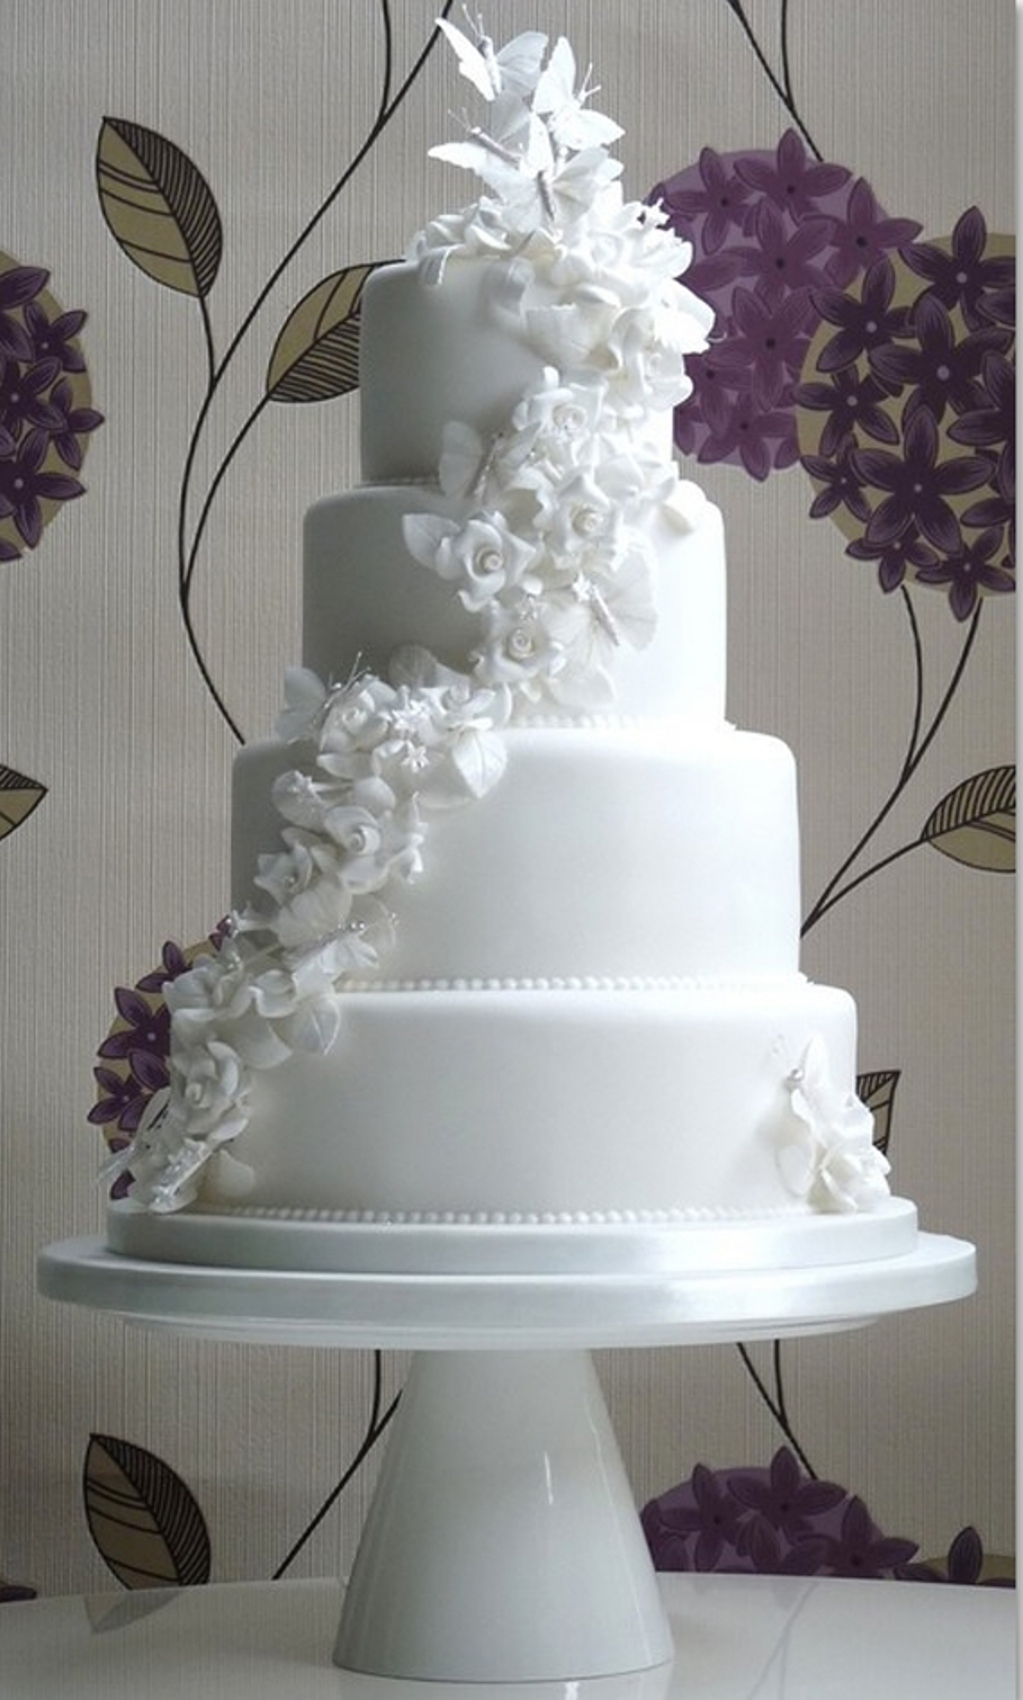 Copy-of-Silver-Wedding-Decorations Wonderful ideas for decorating your wedding